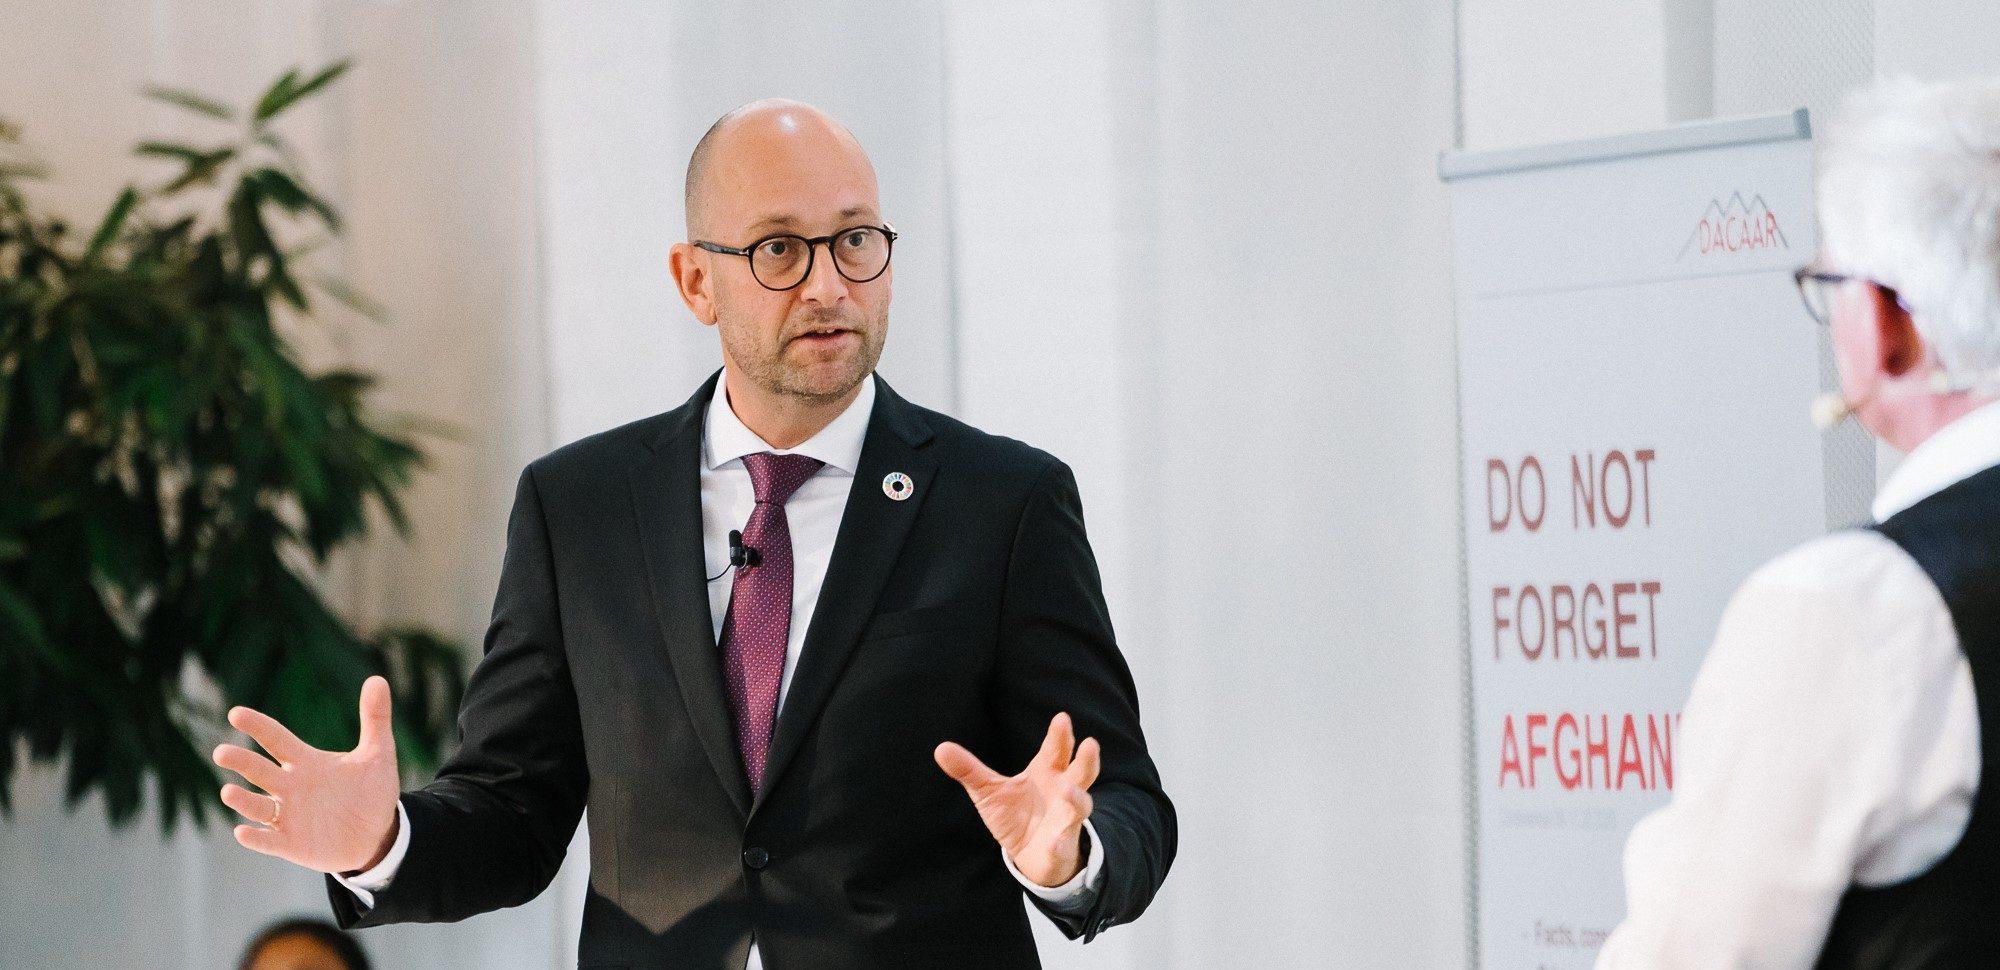 Udviklingsminister Rasmus Prehn (S) vil ikke glemme Afghanistan